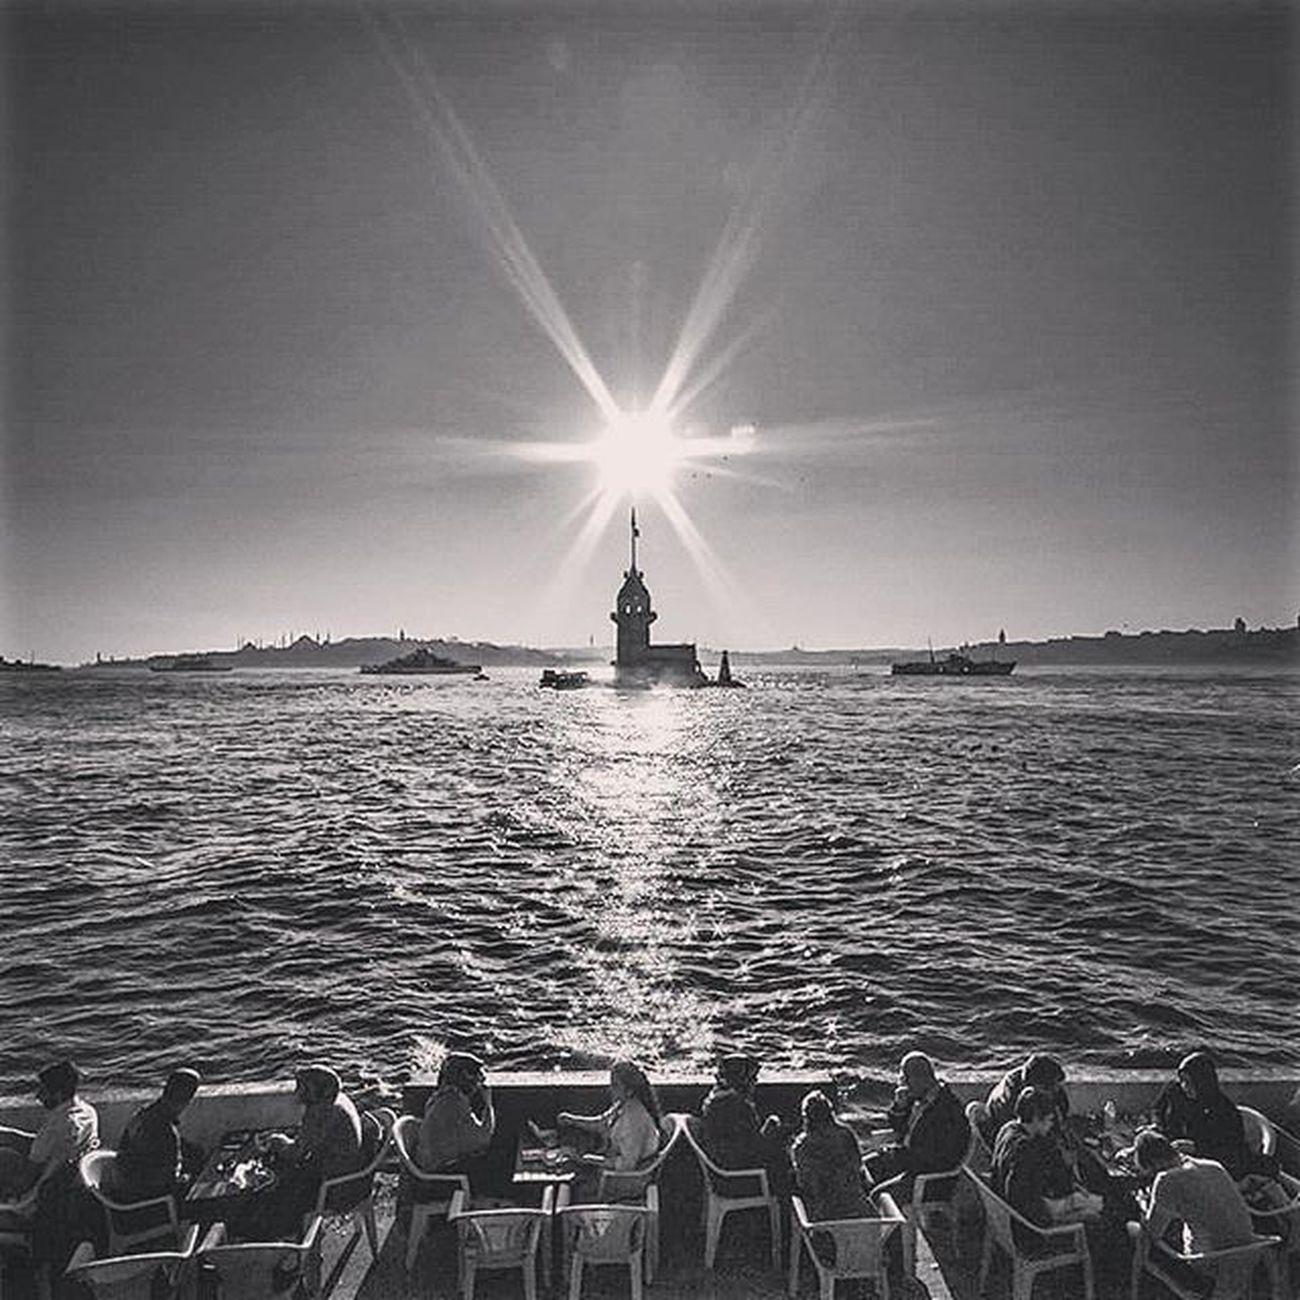 Kız Kulesi... Turkishfollower Altinvizor Awardsturk Bir_dakika Gununkaresi Anlatistanbul Fotografheryerde Hayatakarken Ig_renk Ig_reward Ig_sharepoint Ig_today My_dream_turkey Objektifimden Instagramturkey Istanbuldayasam Objektifindenyansiyanlar Photo_turkey Turk_kadraj Zamanakarsi Safaristanbul Ig_turkey @natgeo @natgeoturkiye Lovefromturkey